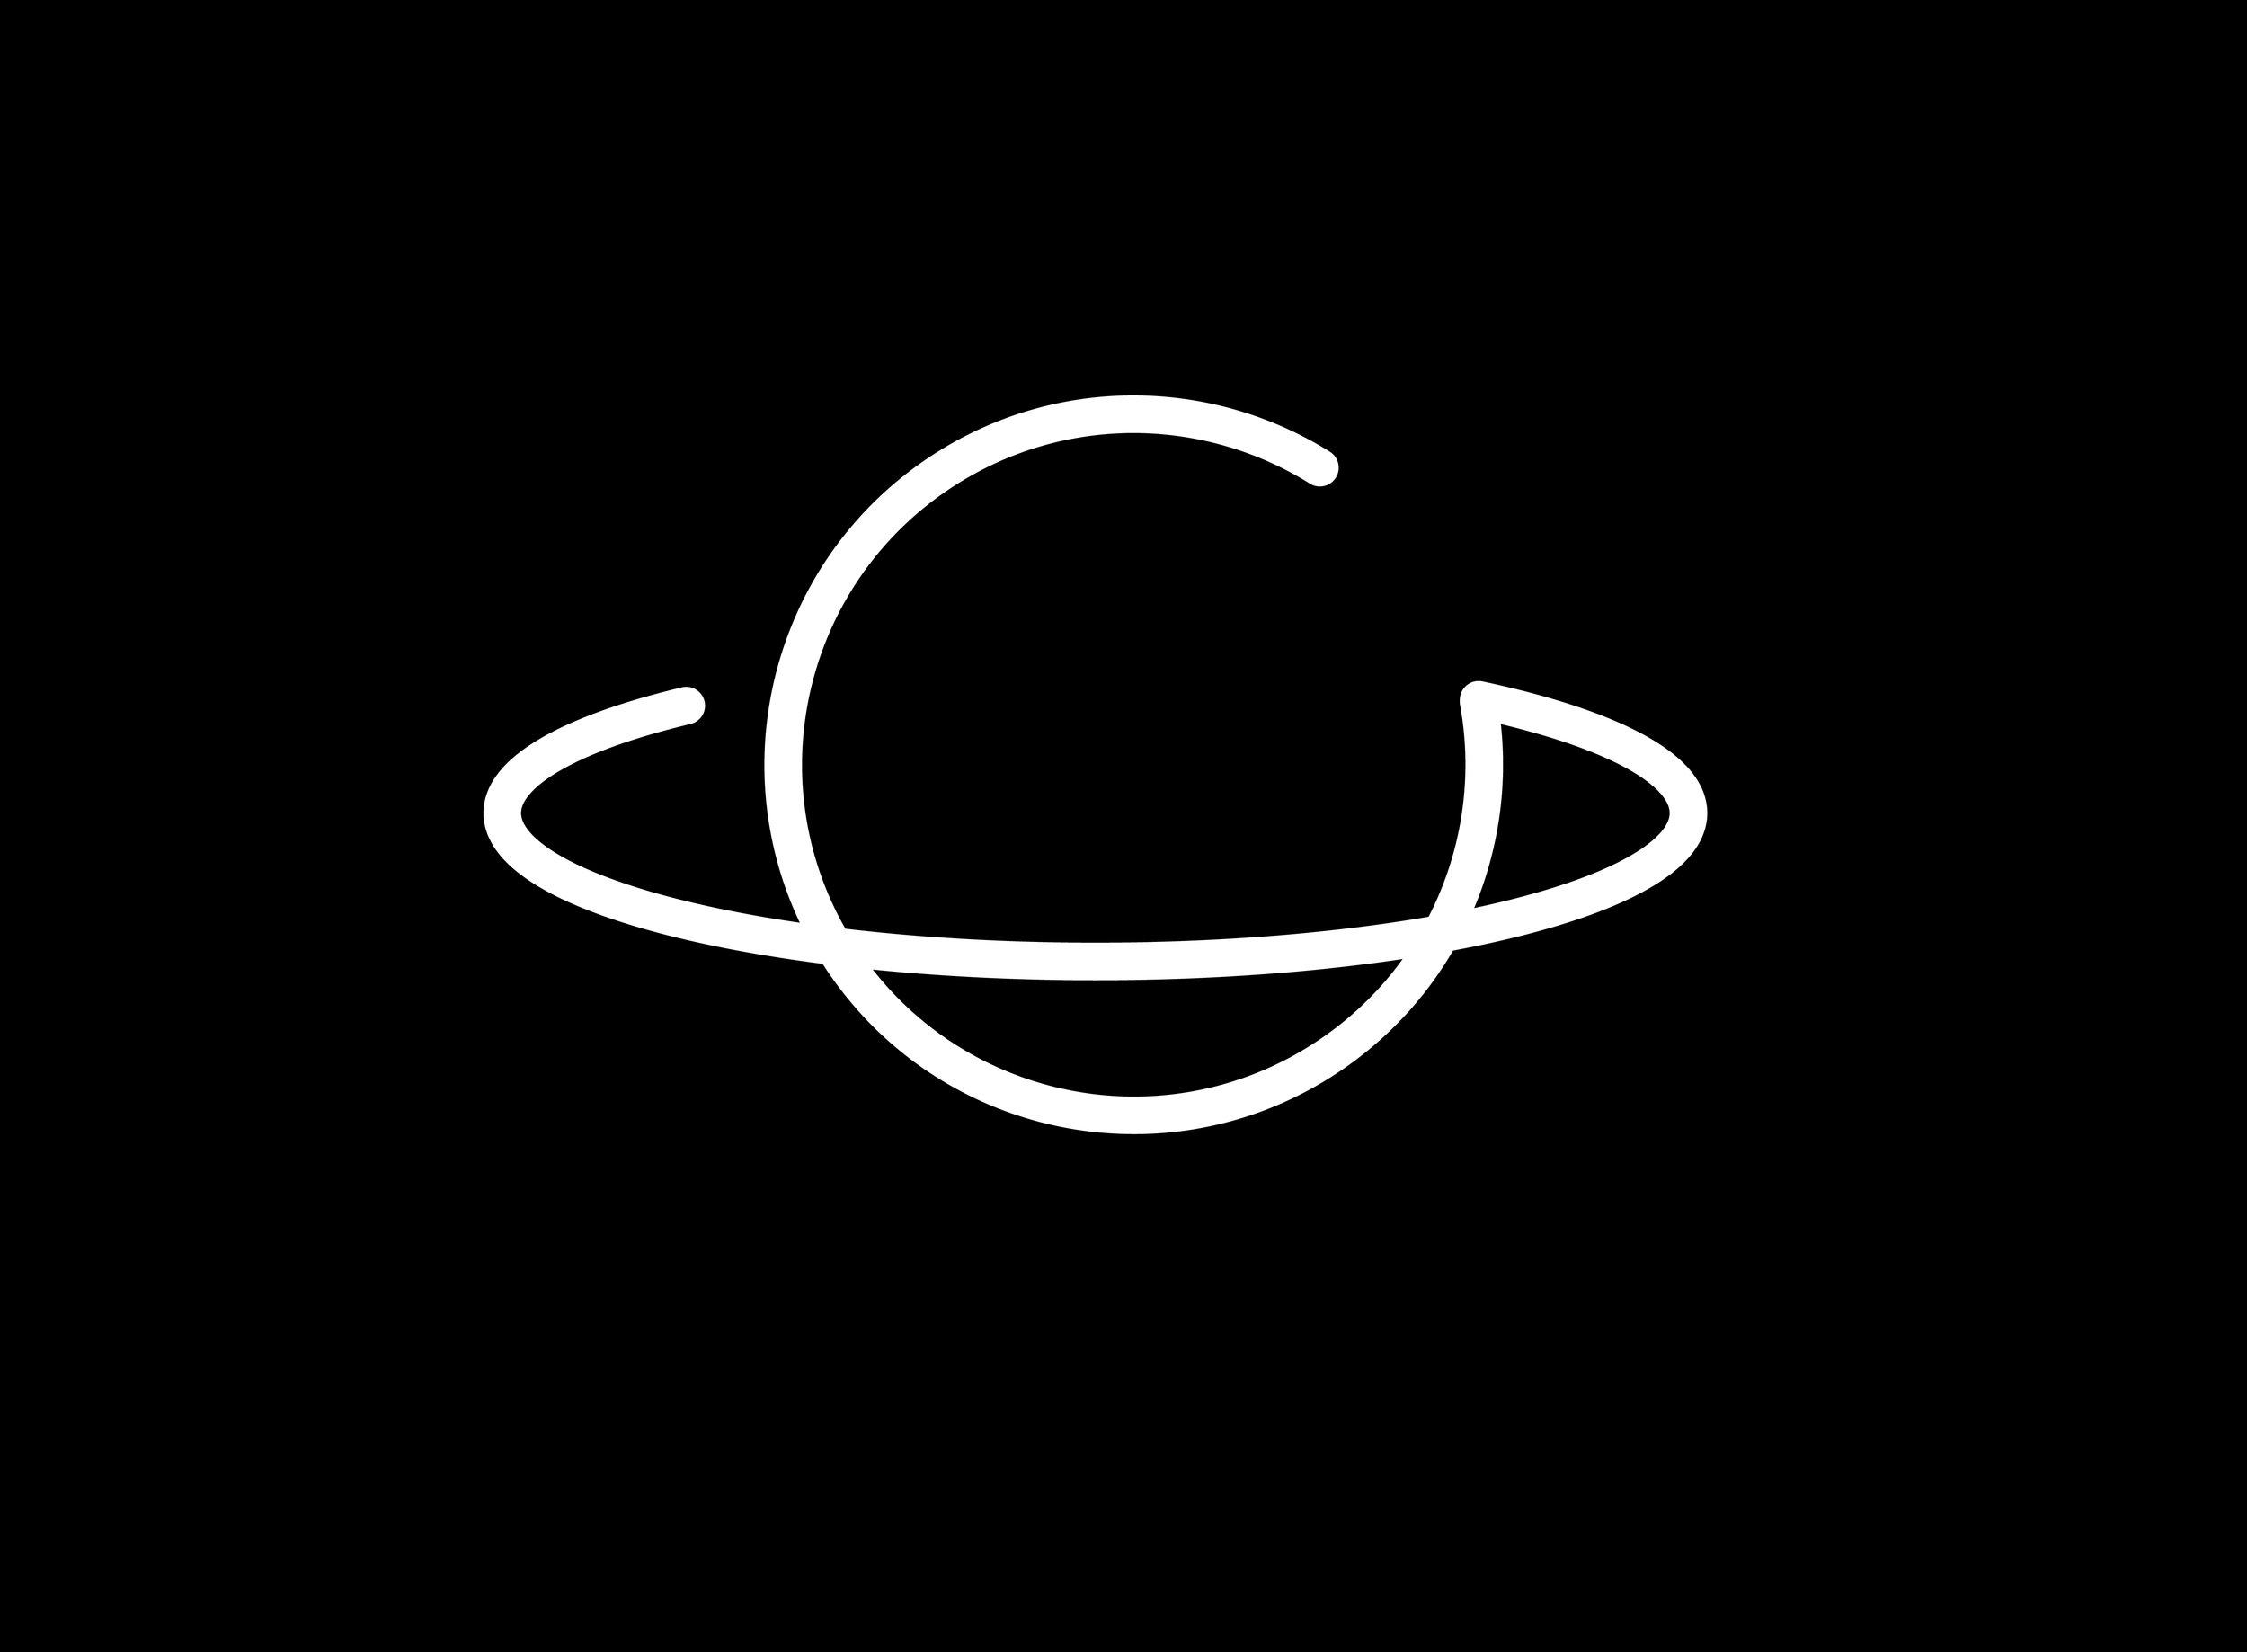 CC-CI-sheet-squarespace-03.jpg